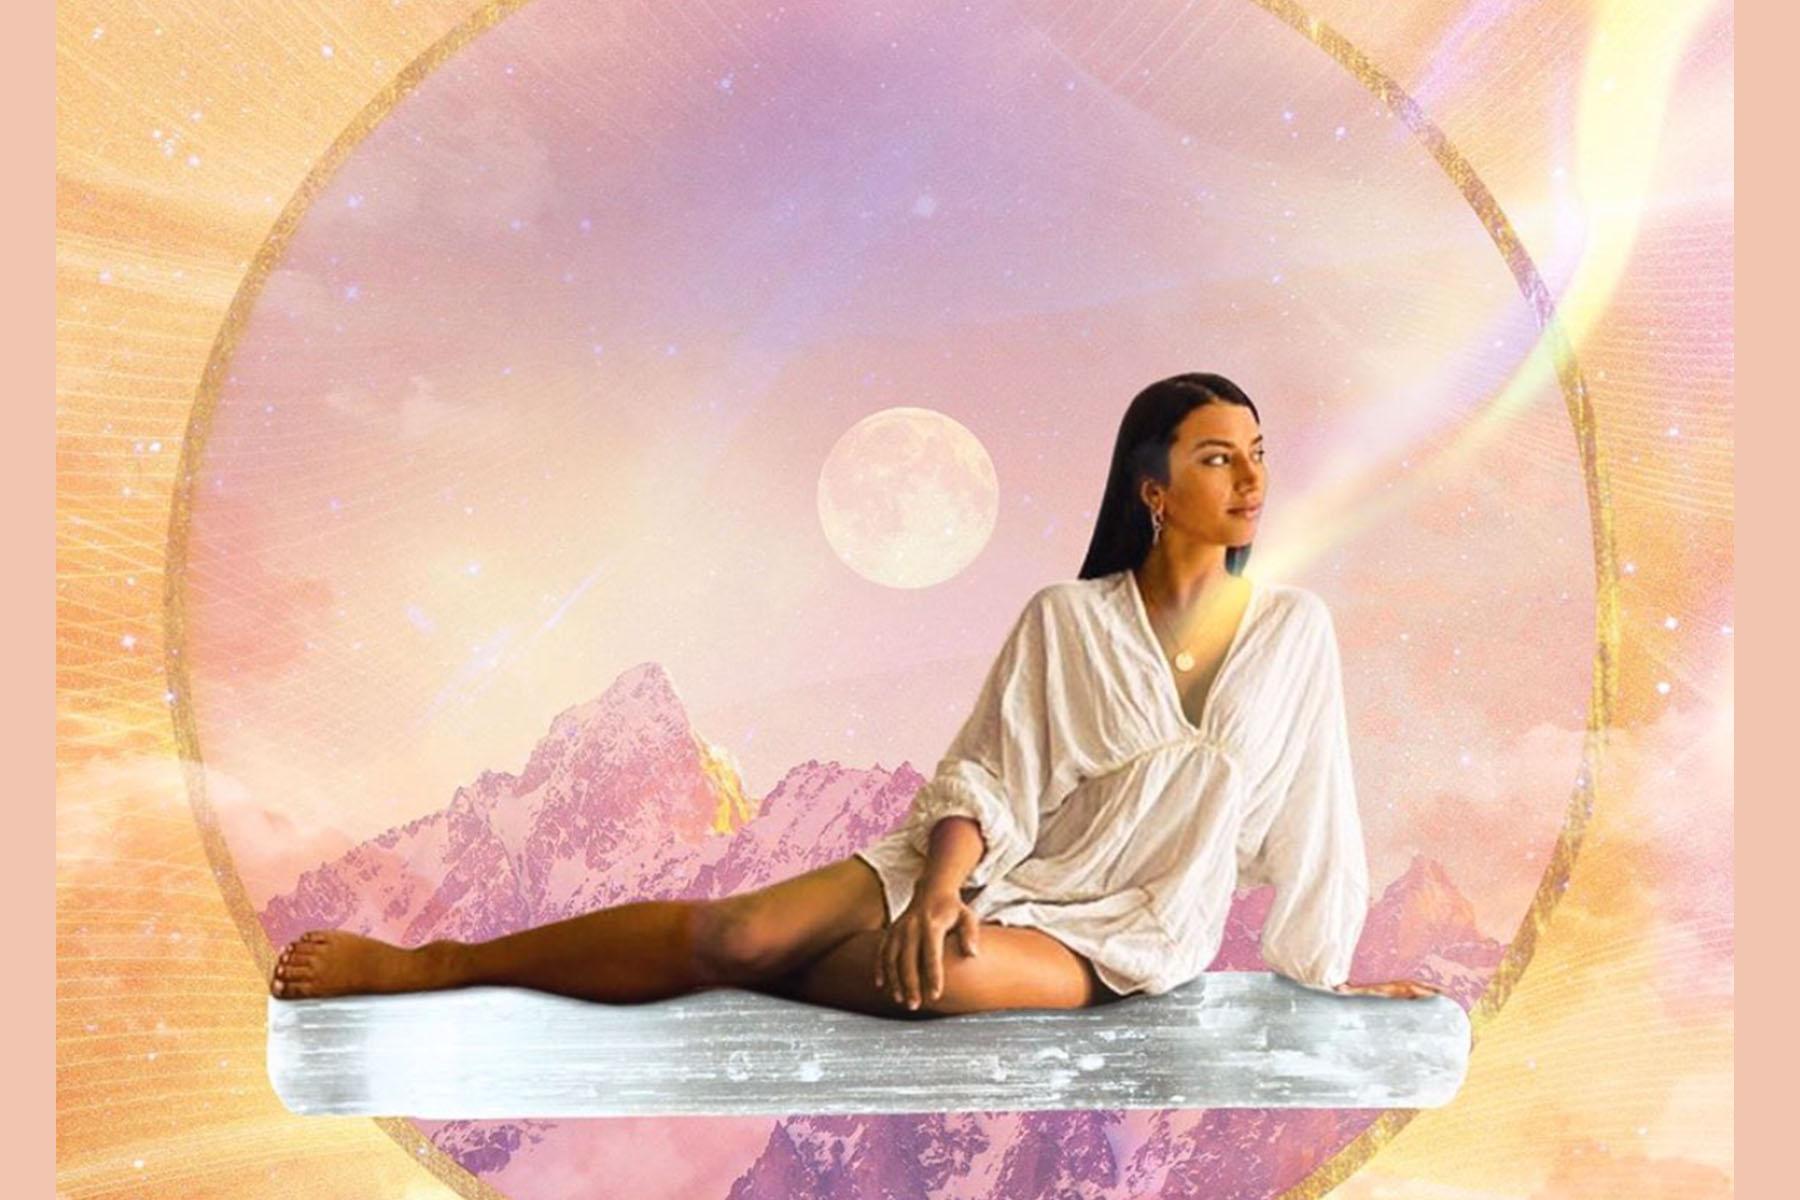 March 2020 Virgo Full Moon Horoscopes